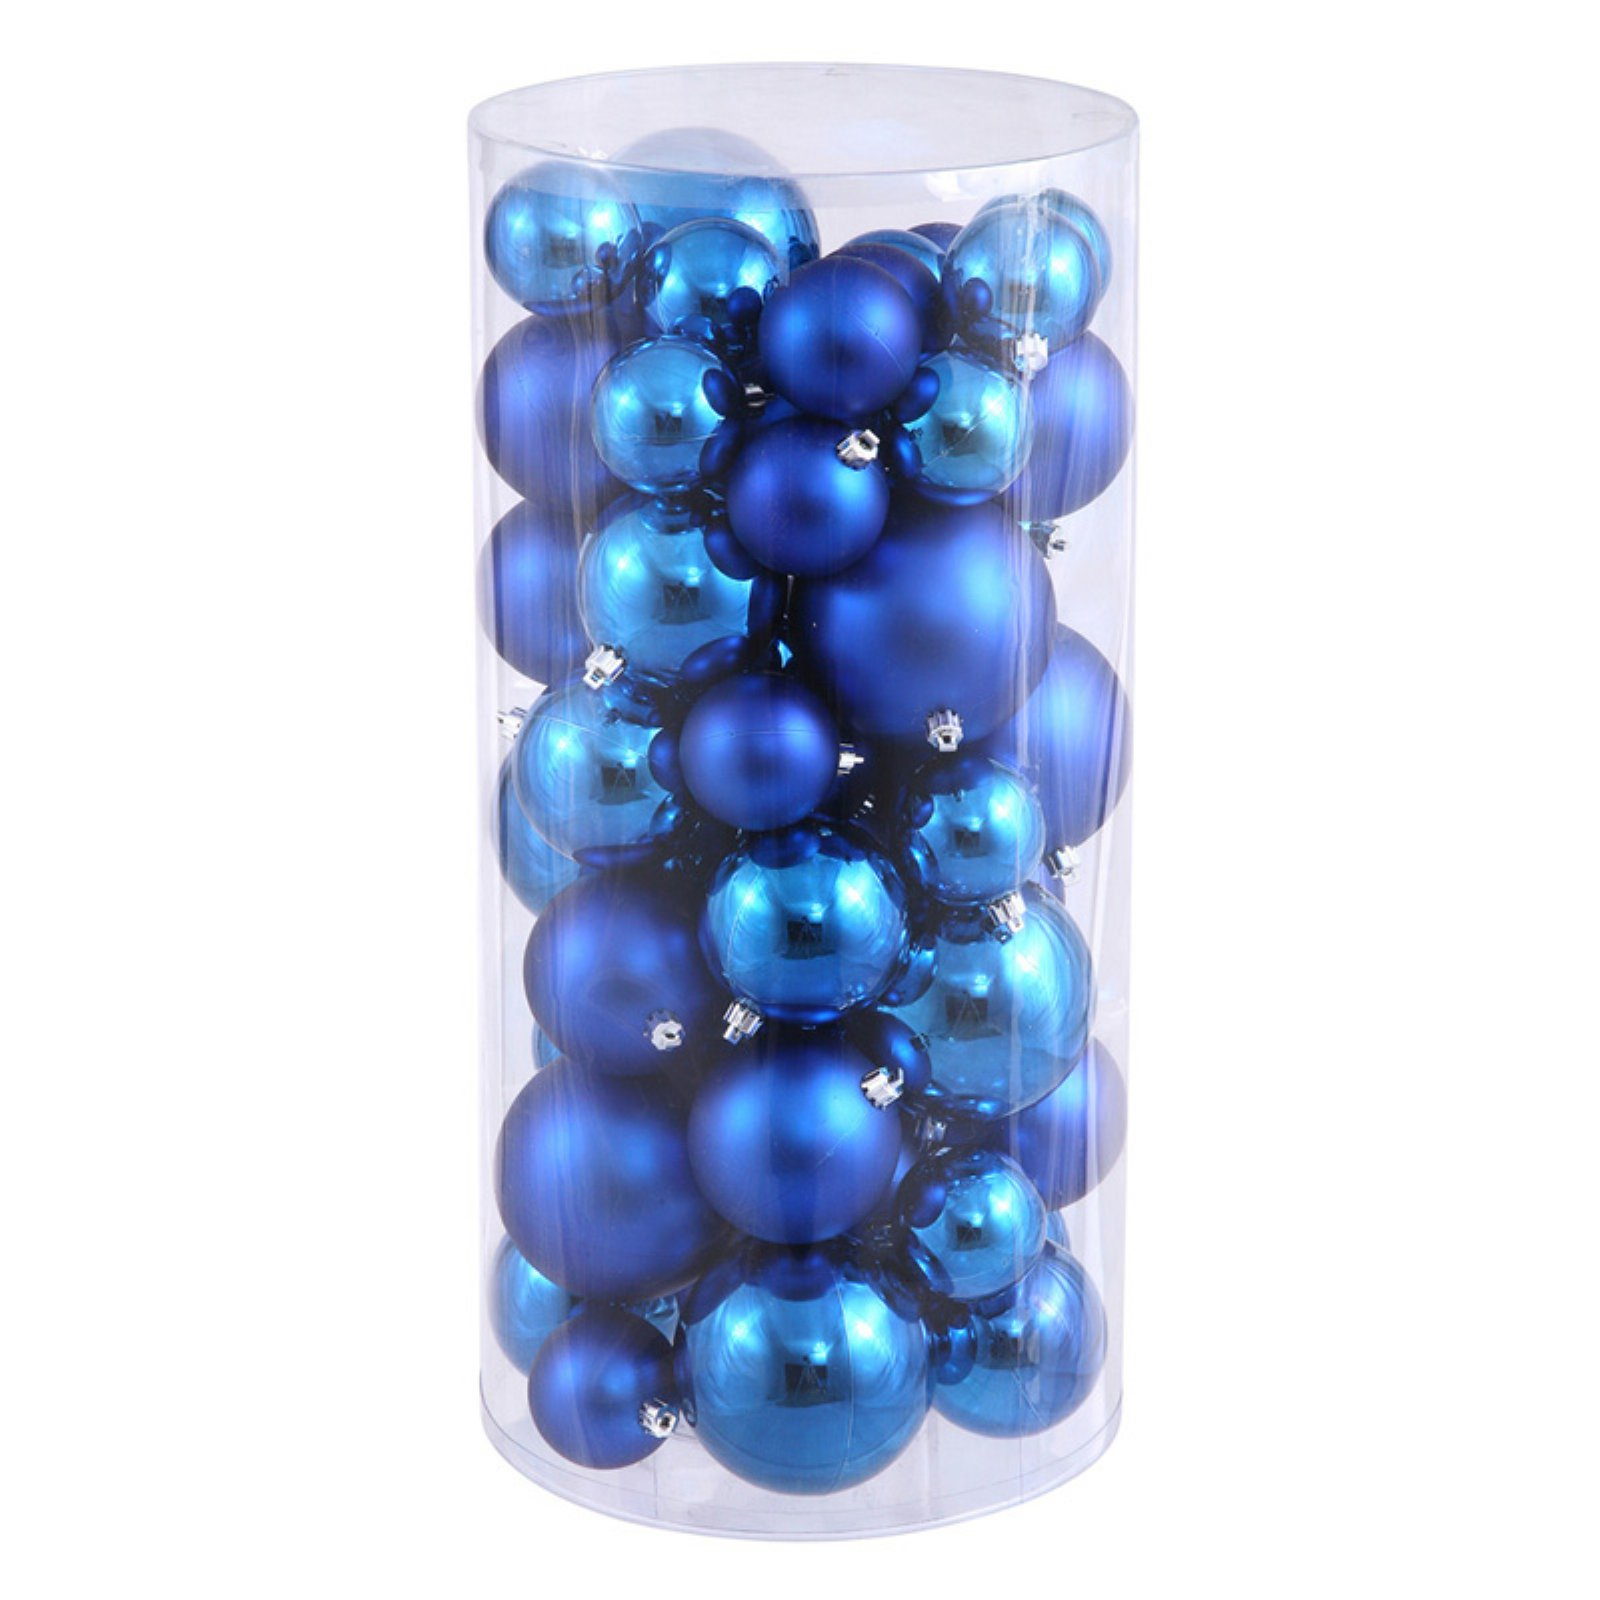 "Vickerman 2.4""/3""/4"" Blue Shiny/Matte Ball Ornaments, Set of 50"